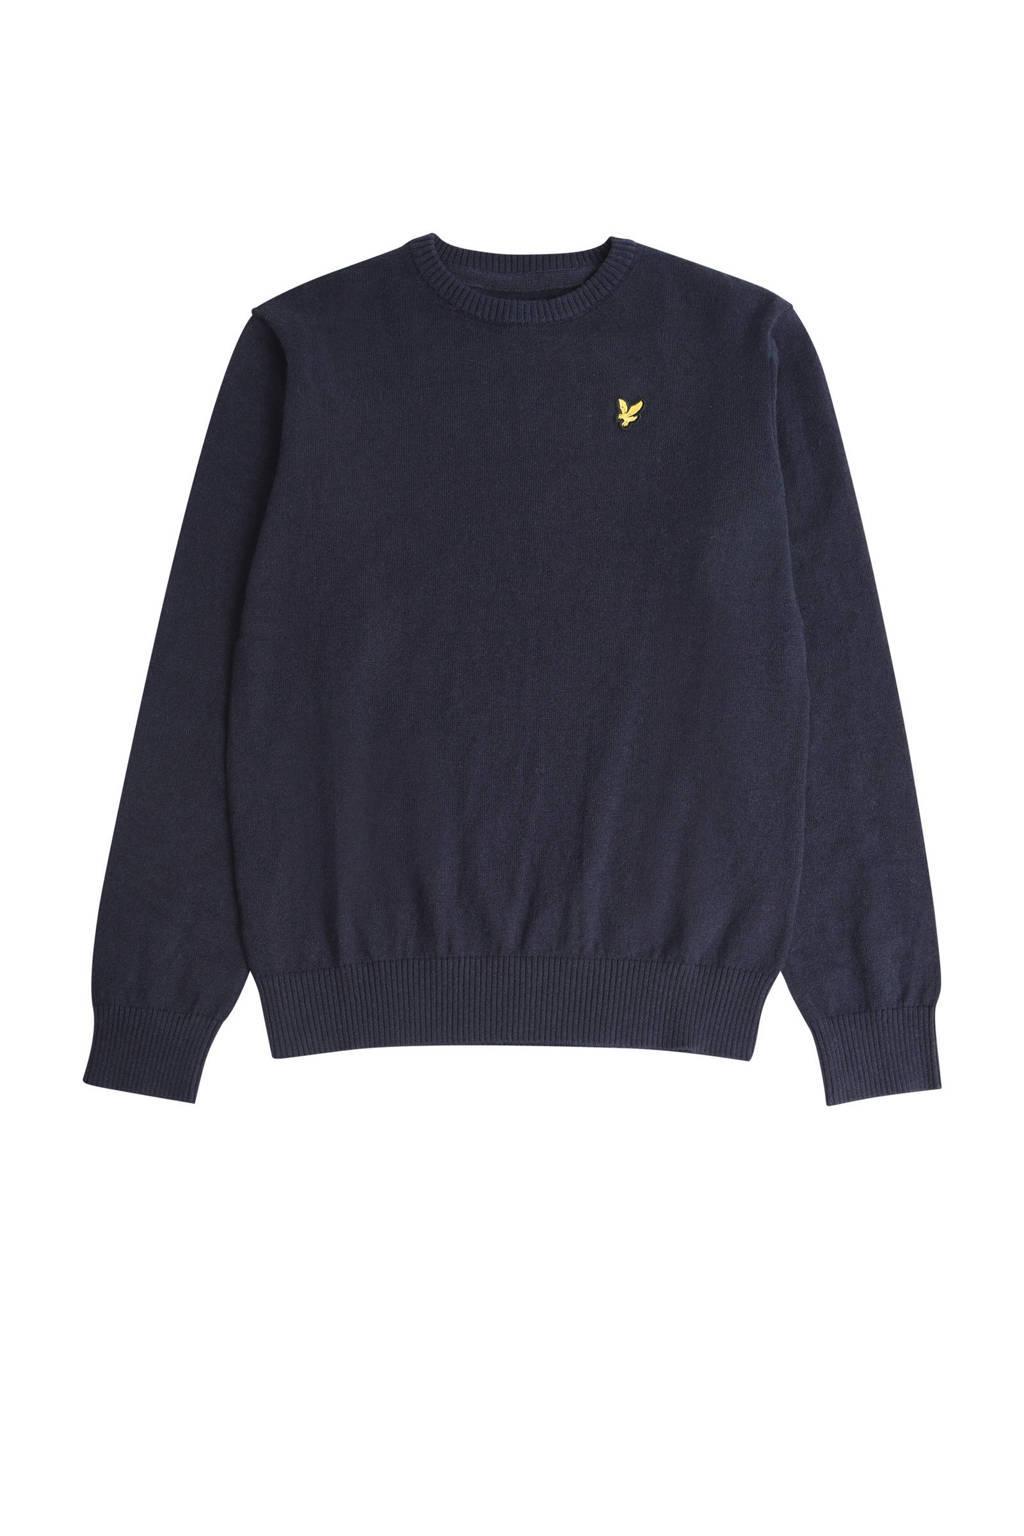 Lyle & Scott trui met logo donkerblauw, Donkerblauw